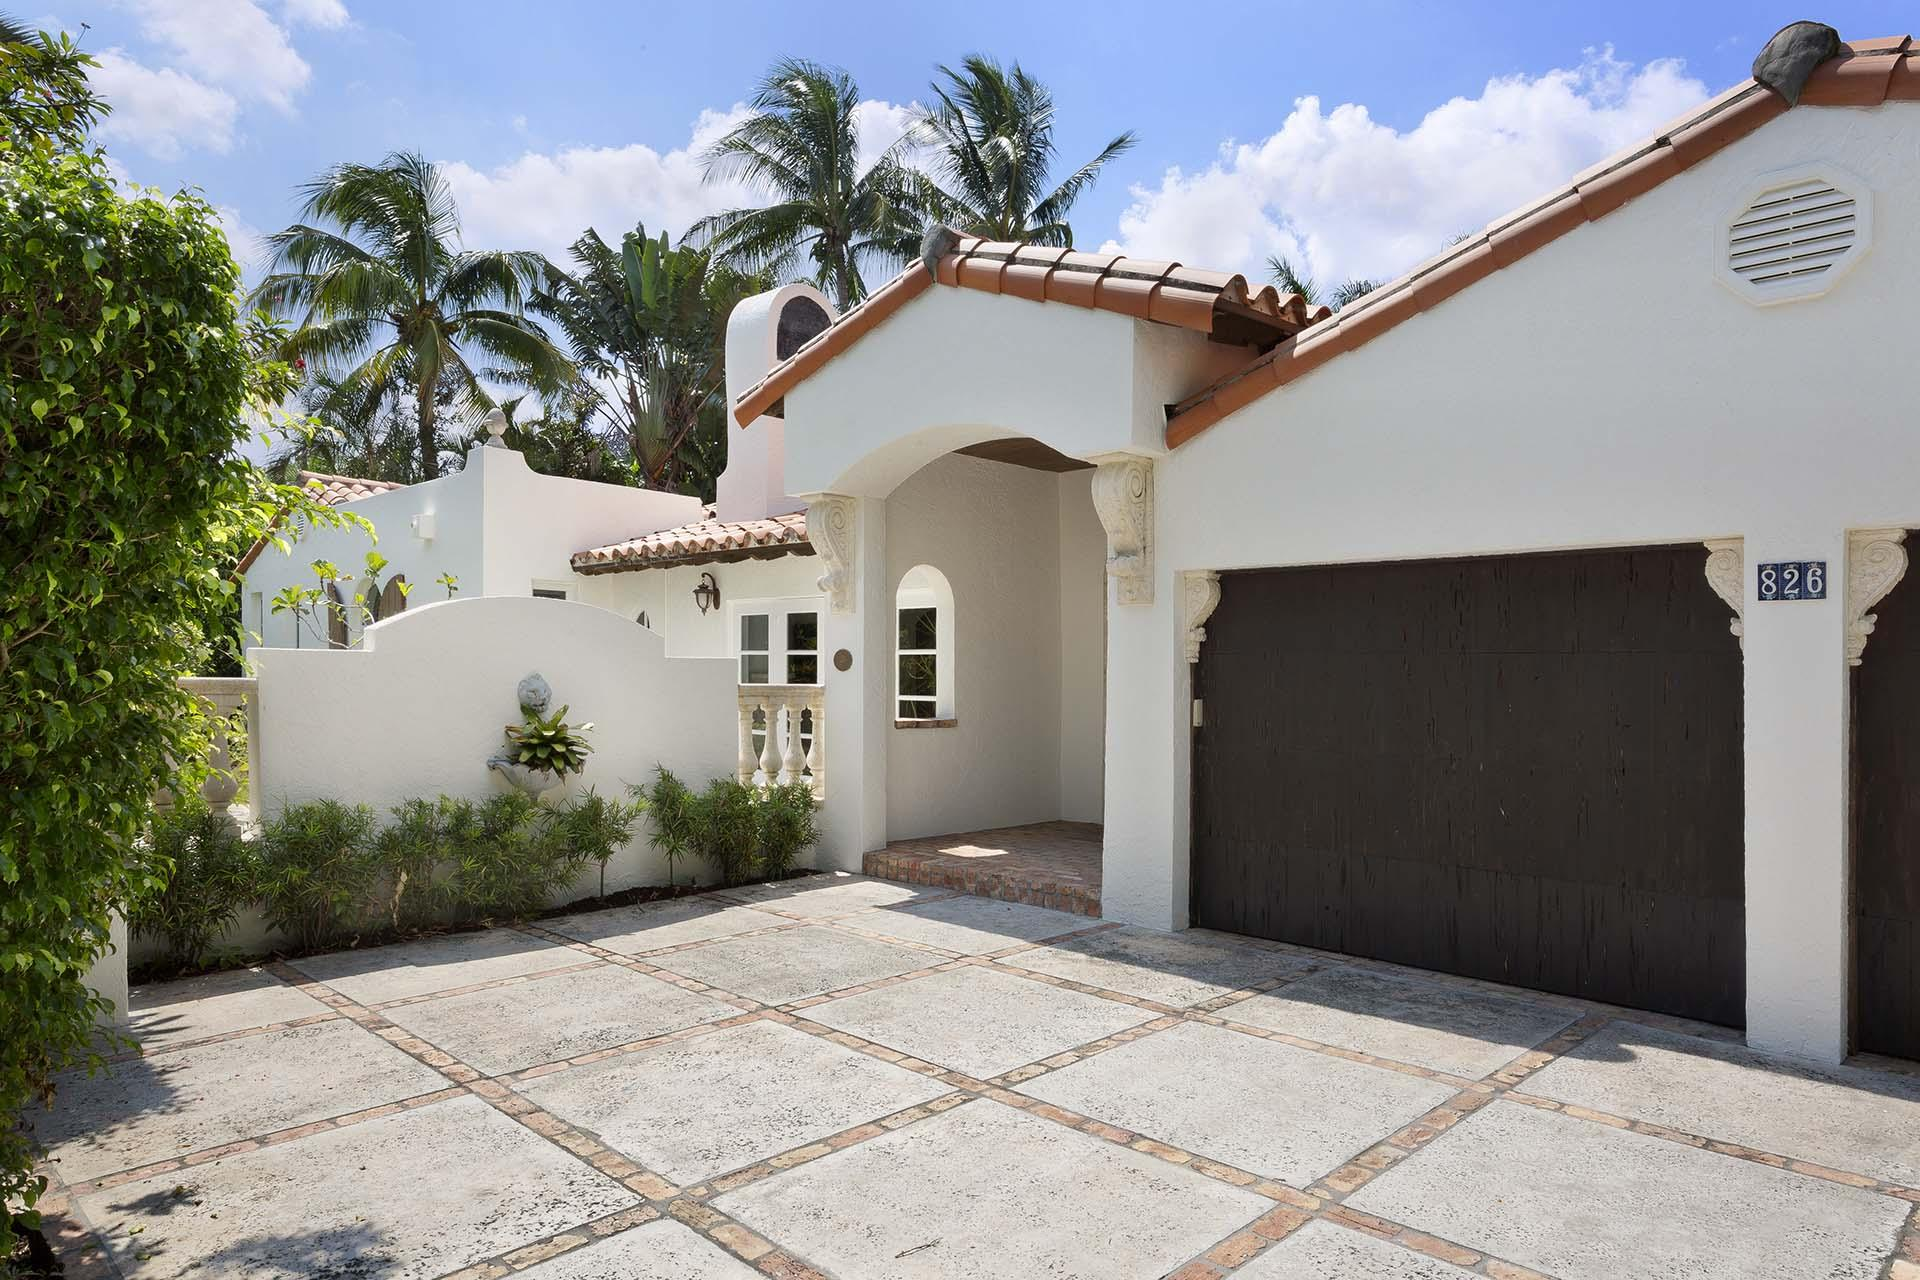 Home for sale in Old Floresta Boca Raton Florida